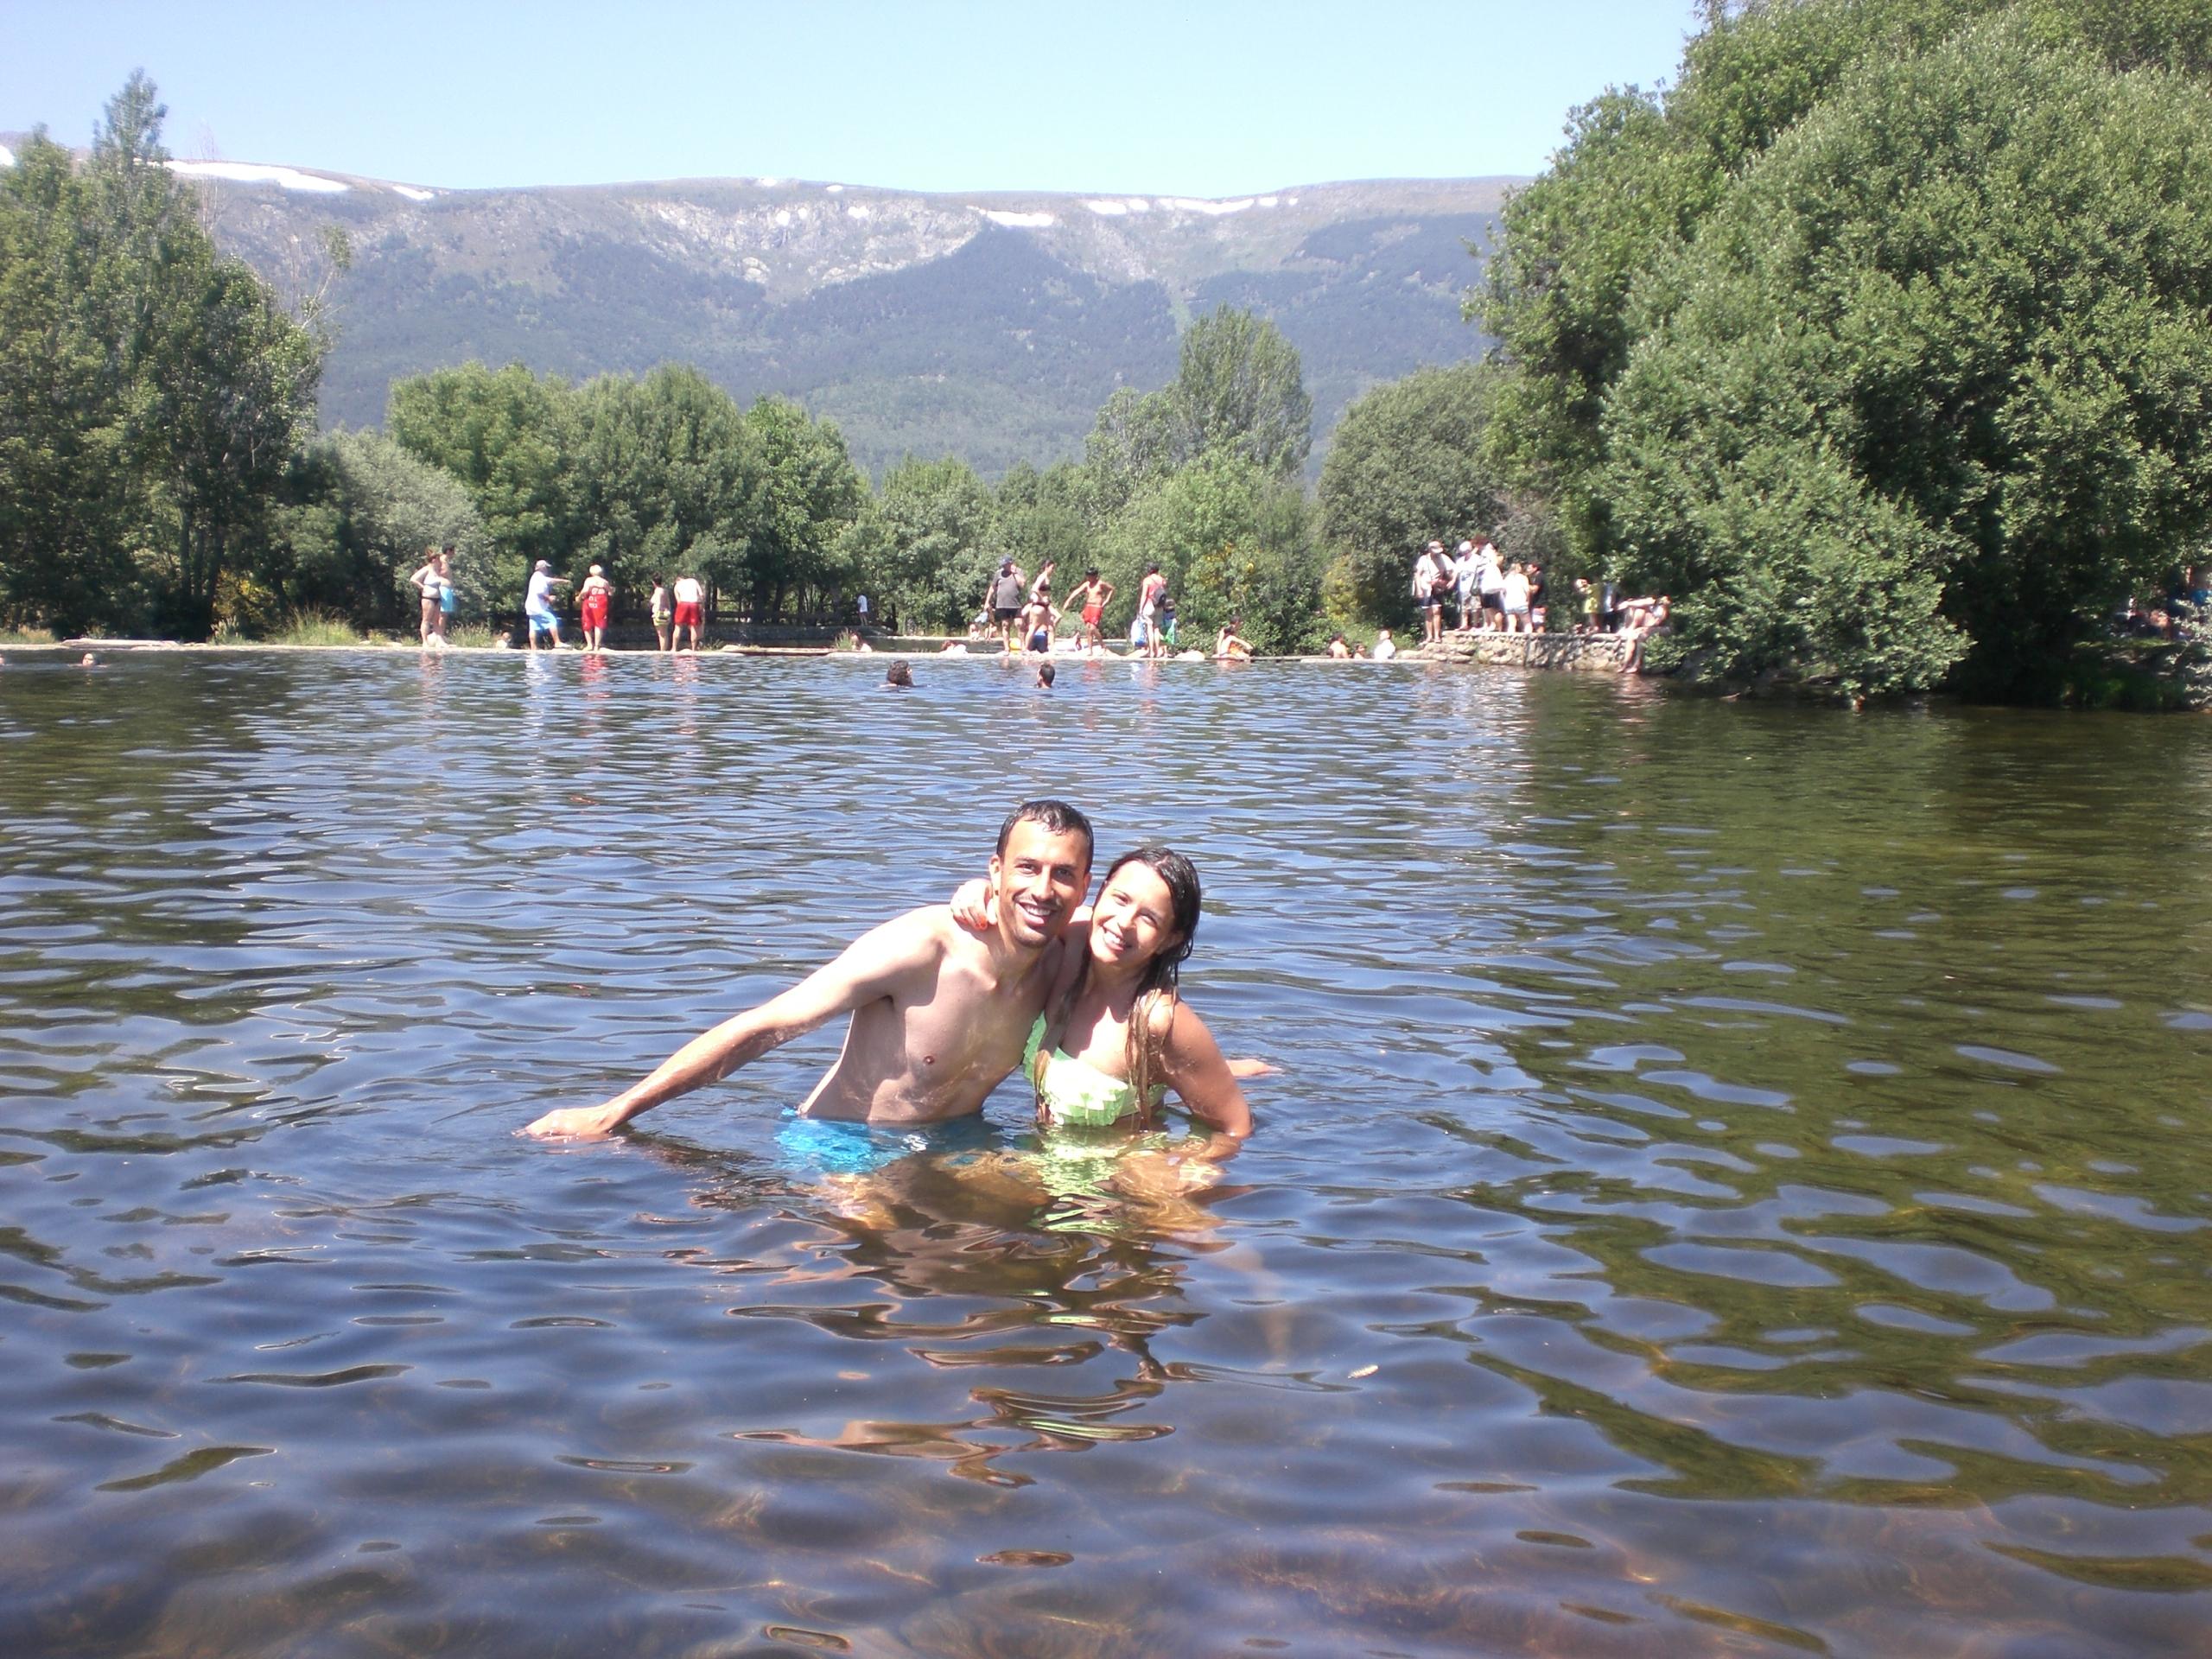 Piscinas naturales en rascafr a madrid natural pools in for Piscinas naturales las presillas